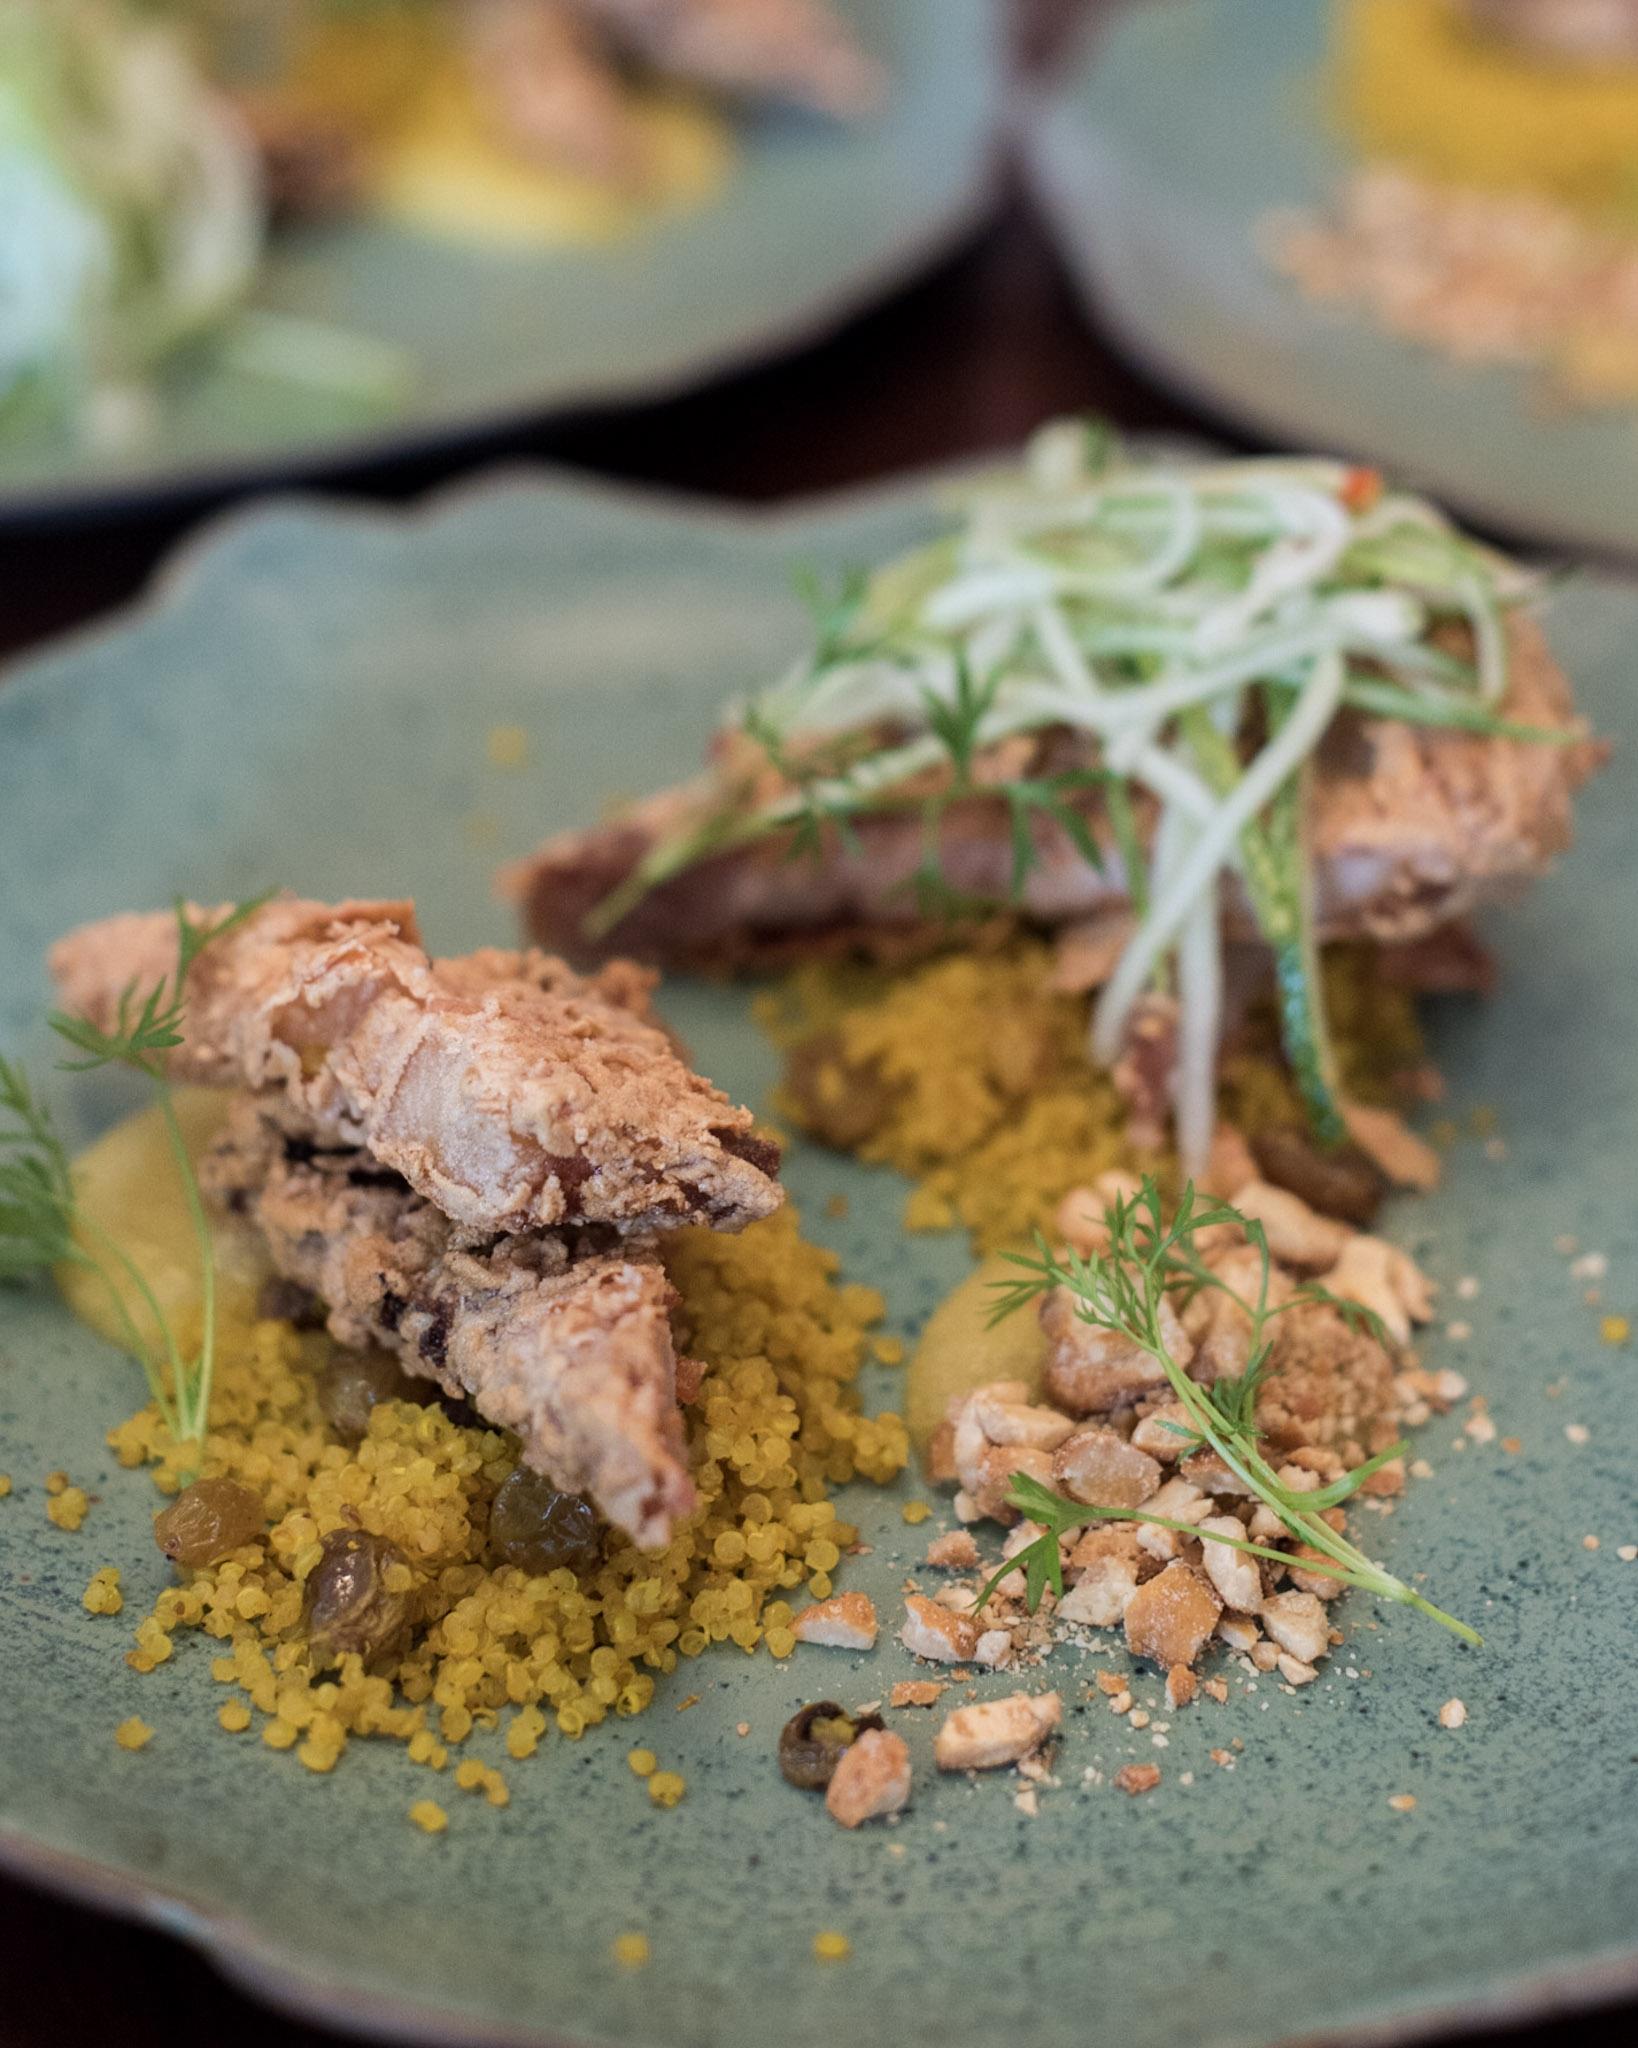 Crispy Pork Belly with Spiced Quinoa, Cashew Nut, Pineapple Puree